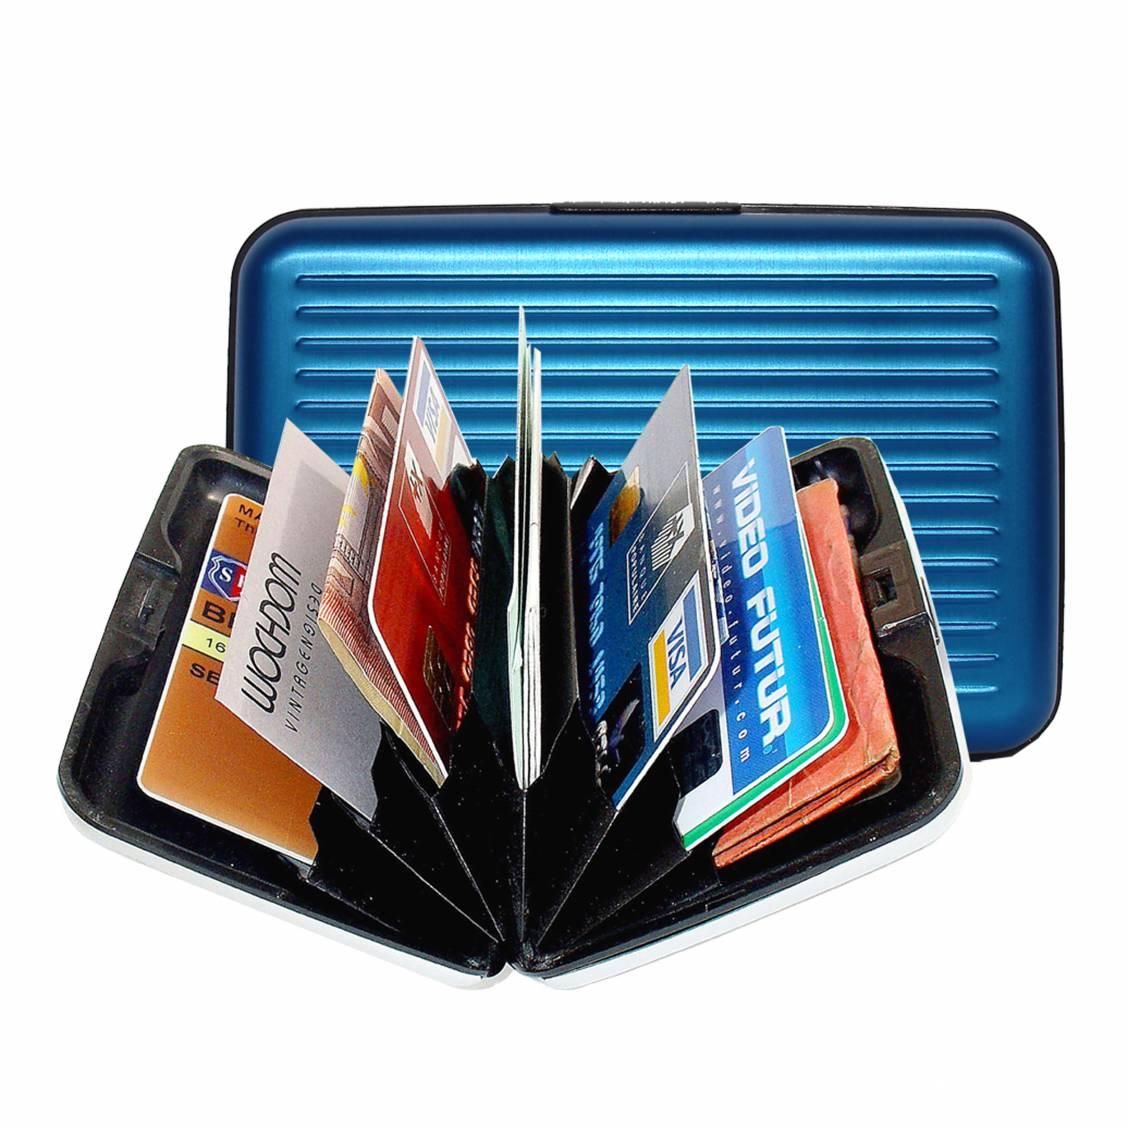 Porte cartes gon bleu rue des hommes for Porte carte homme